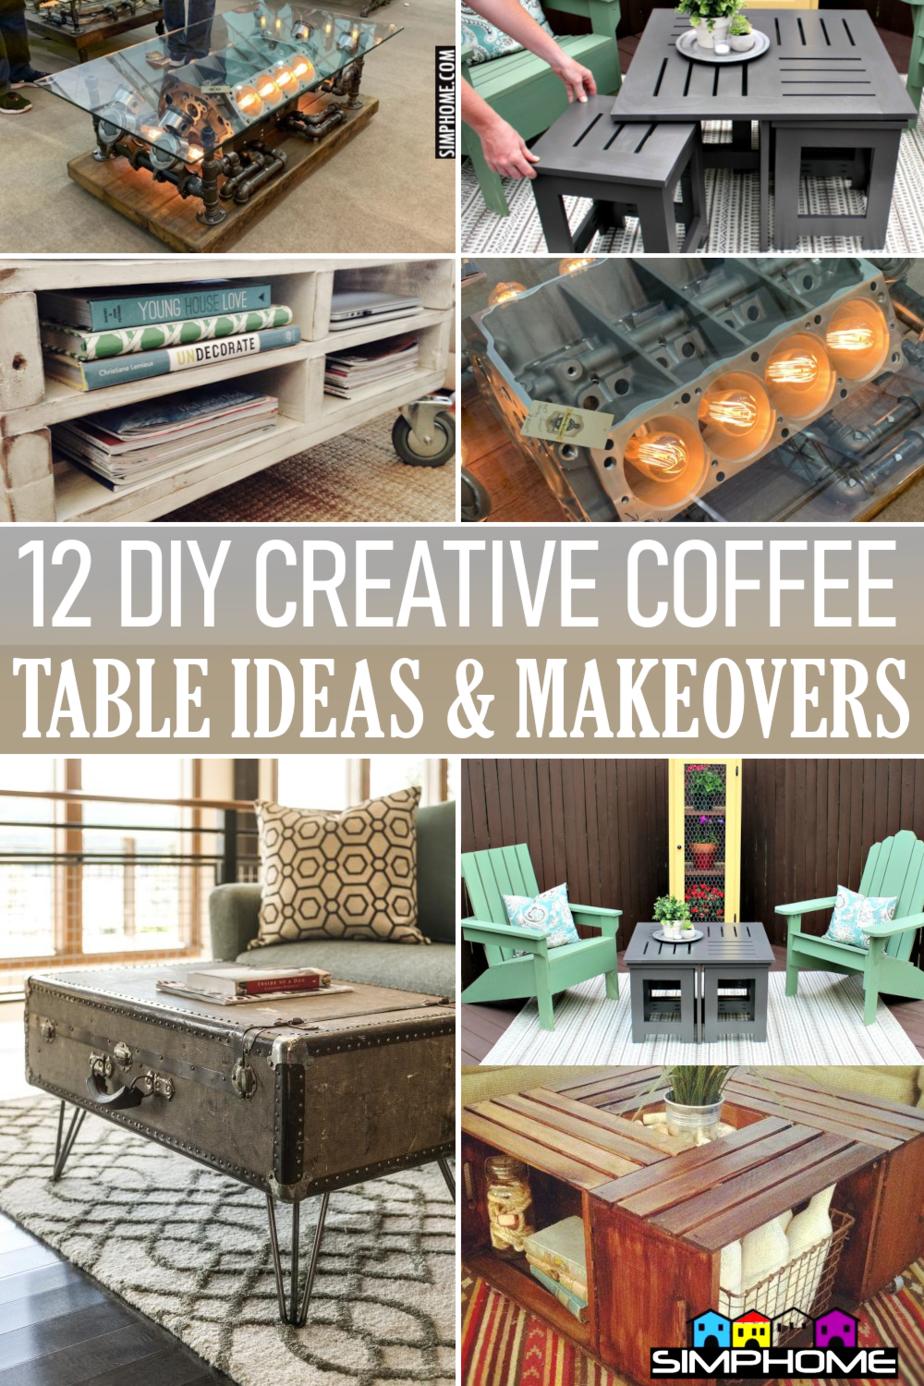 12 Coffee table ideas and DIY via Simphome.com Featured